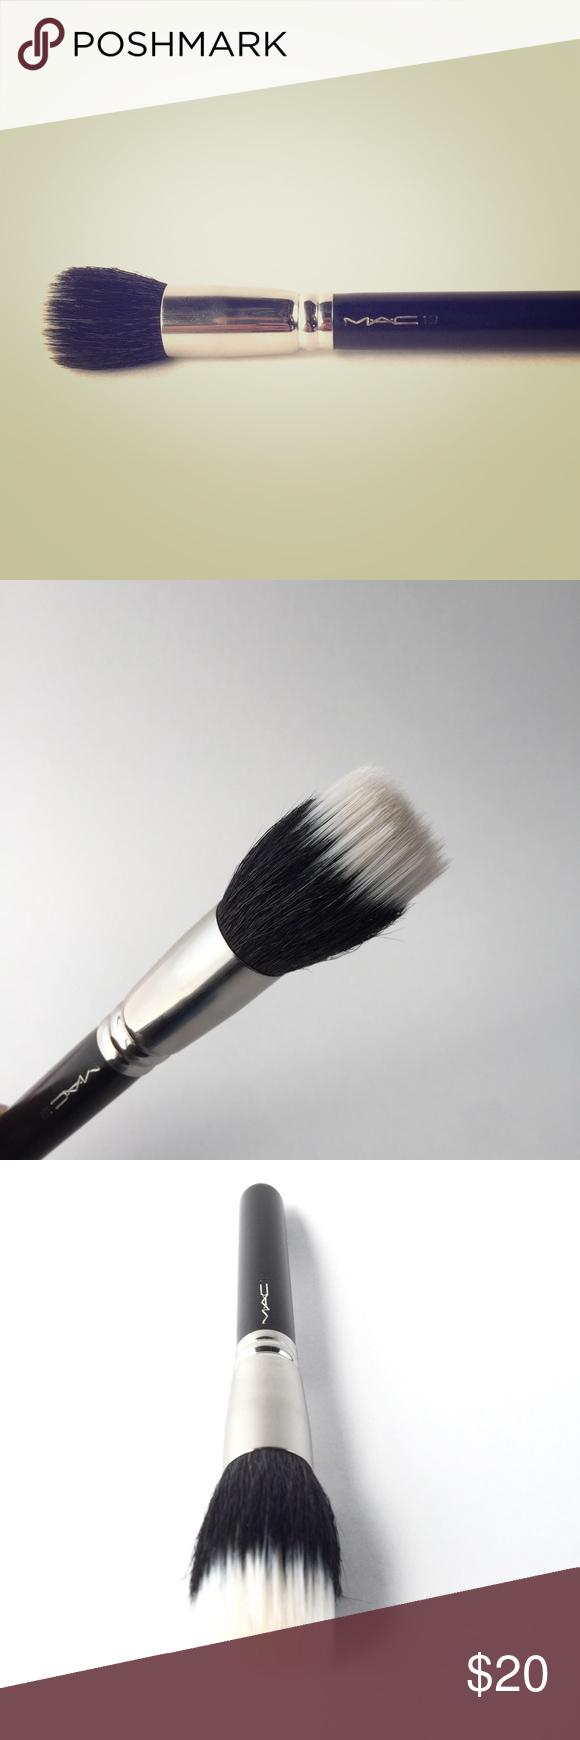 Mac stippling brush in 2020 Tinted moisturizer